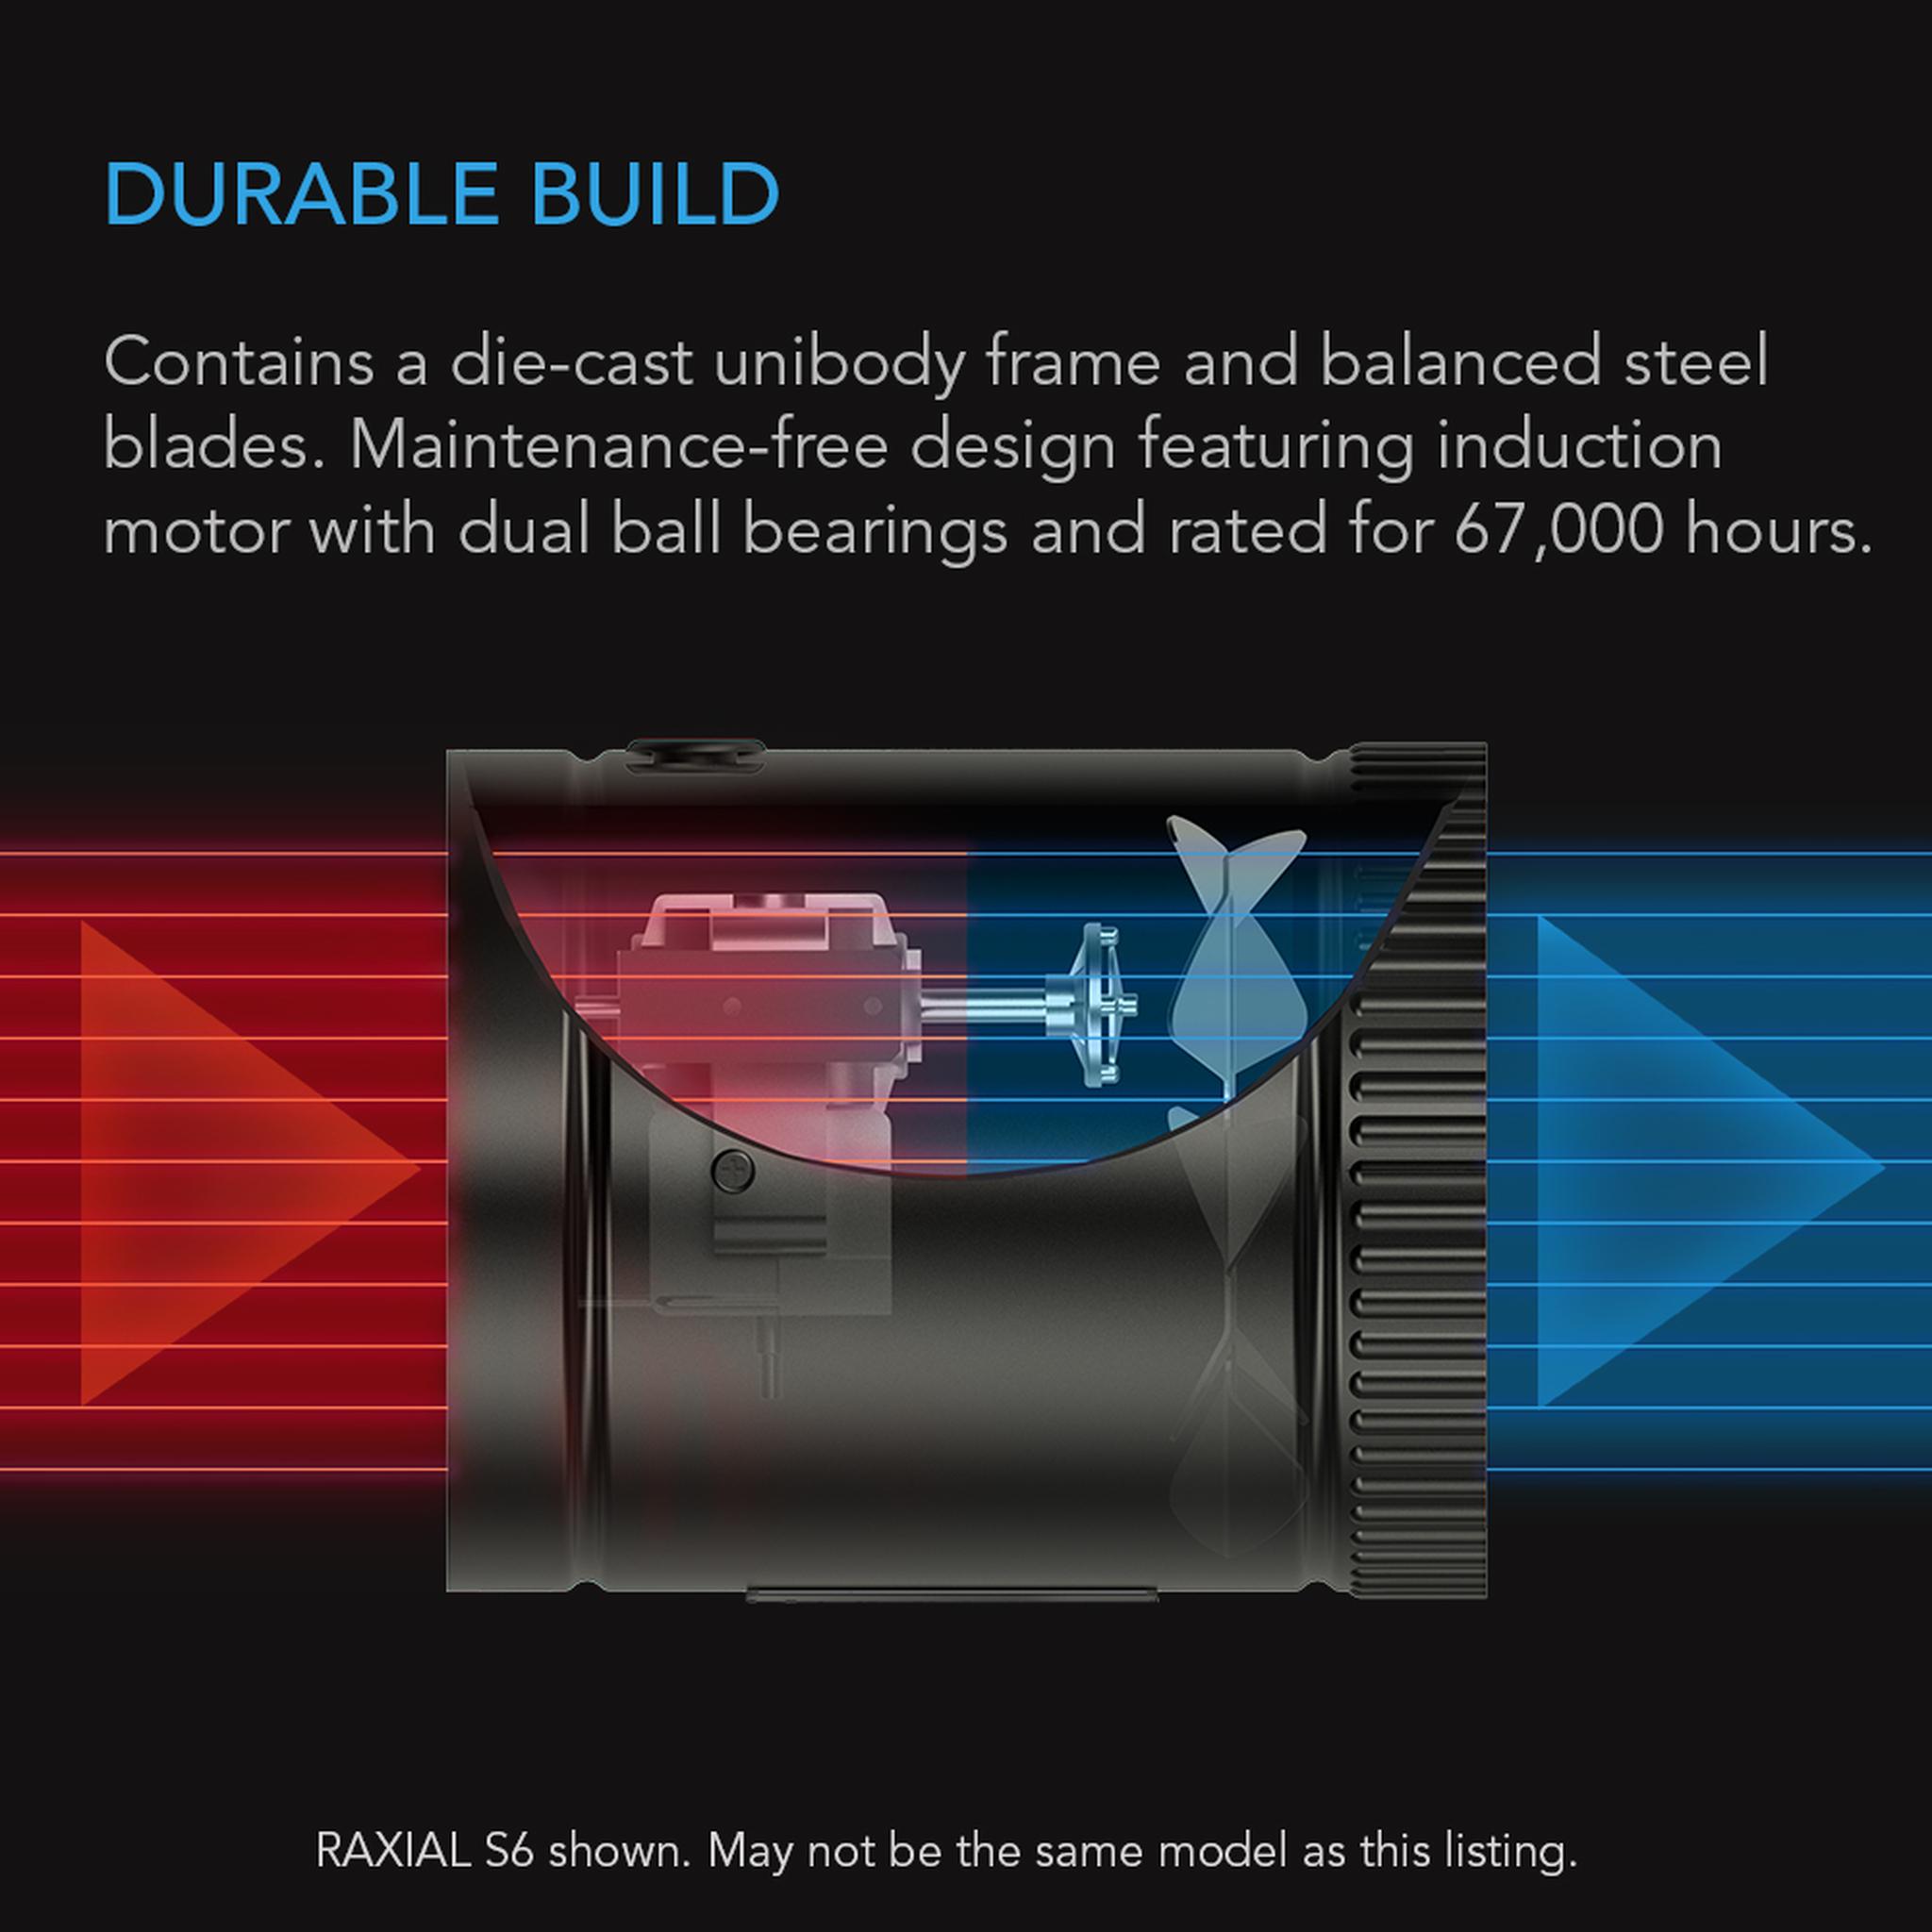 Durable Build